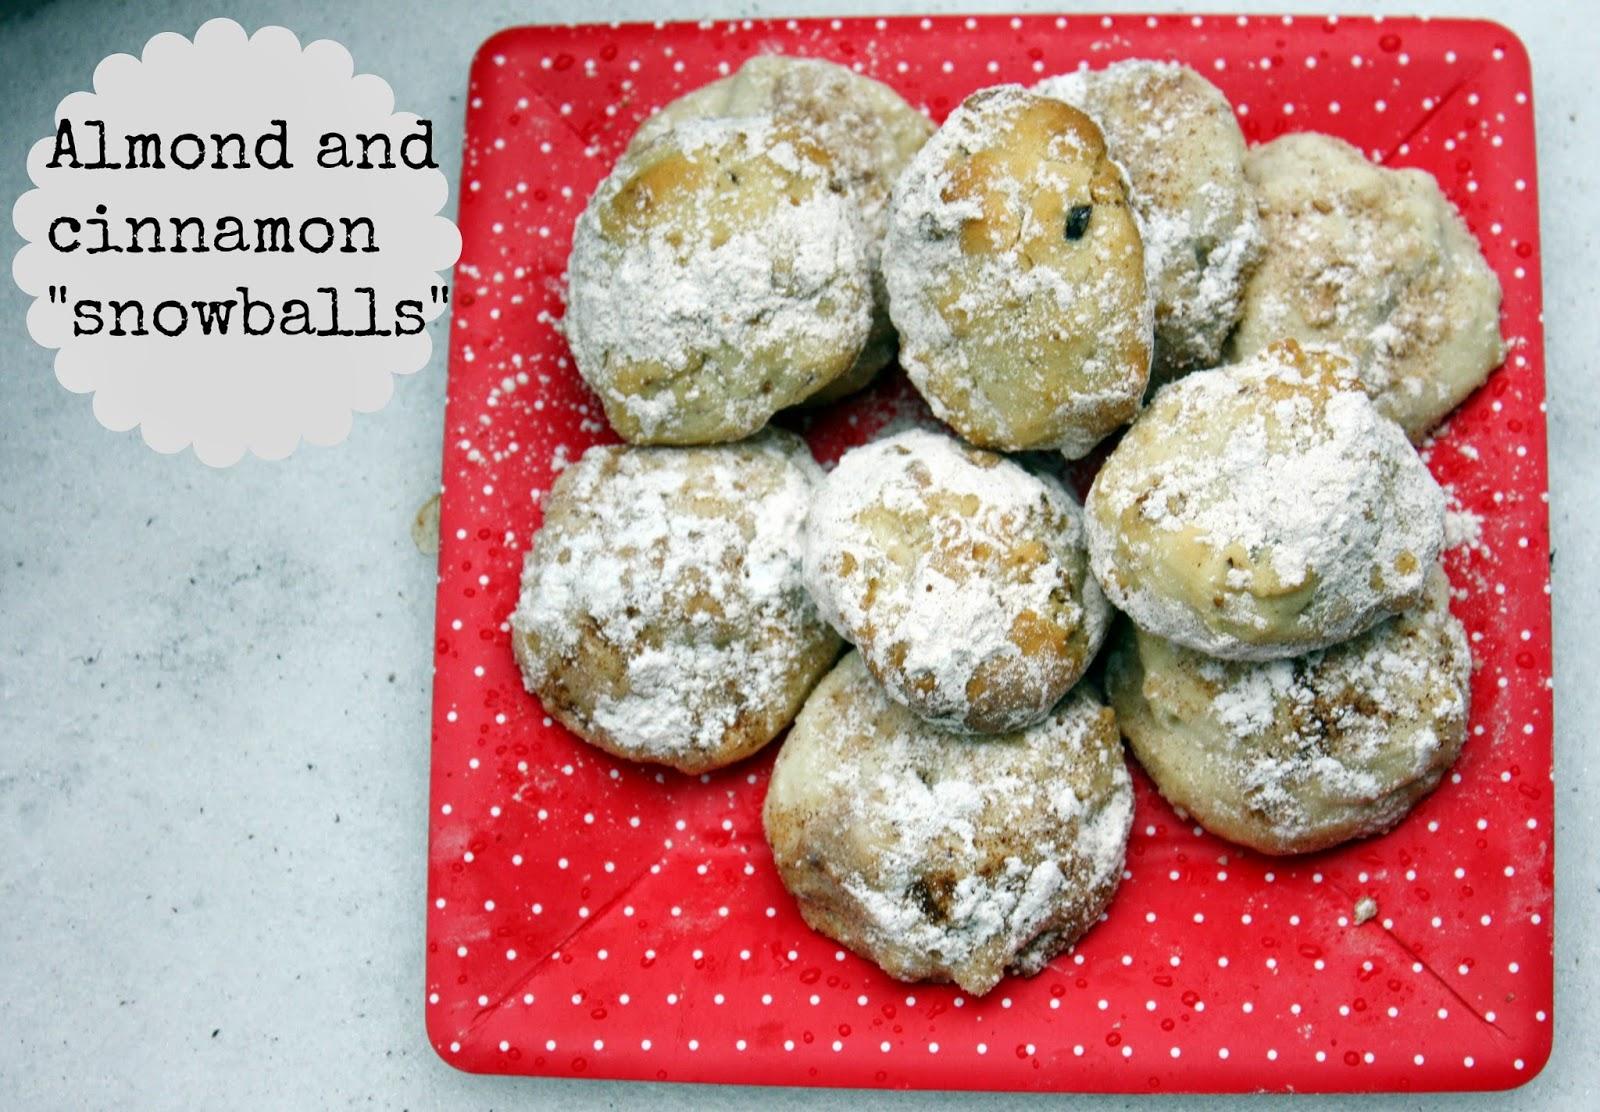 Almond and cinnamon snowball cookies